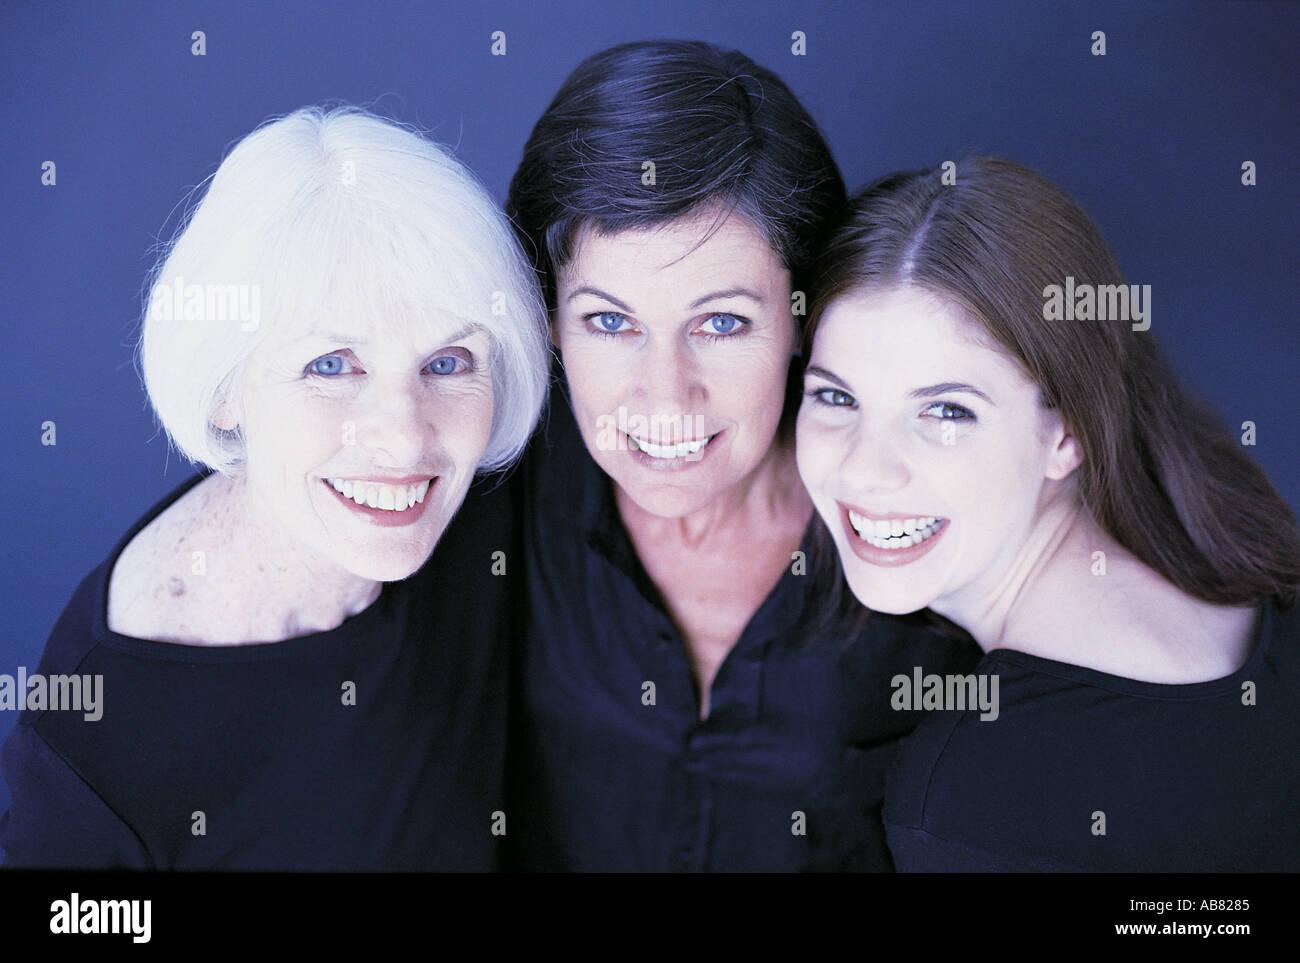 Portrait of three female family members - Stock Image